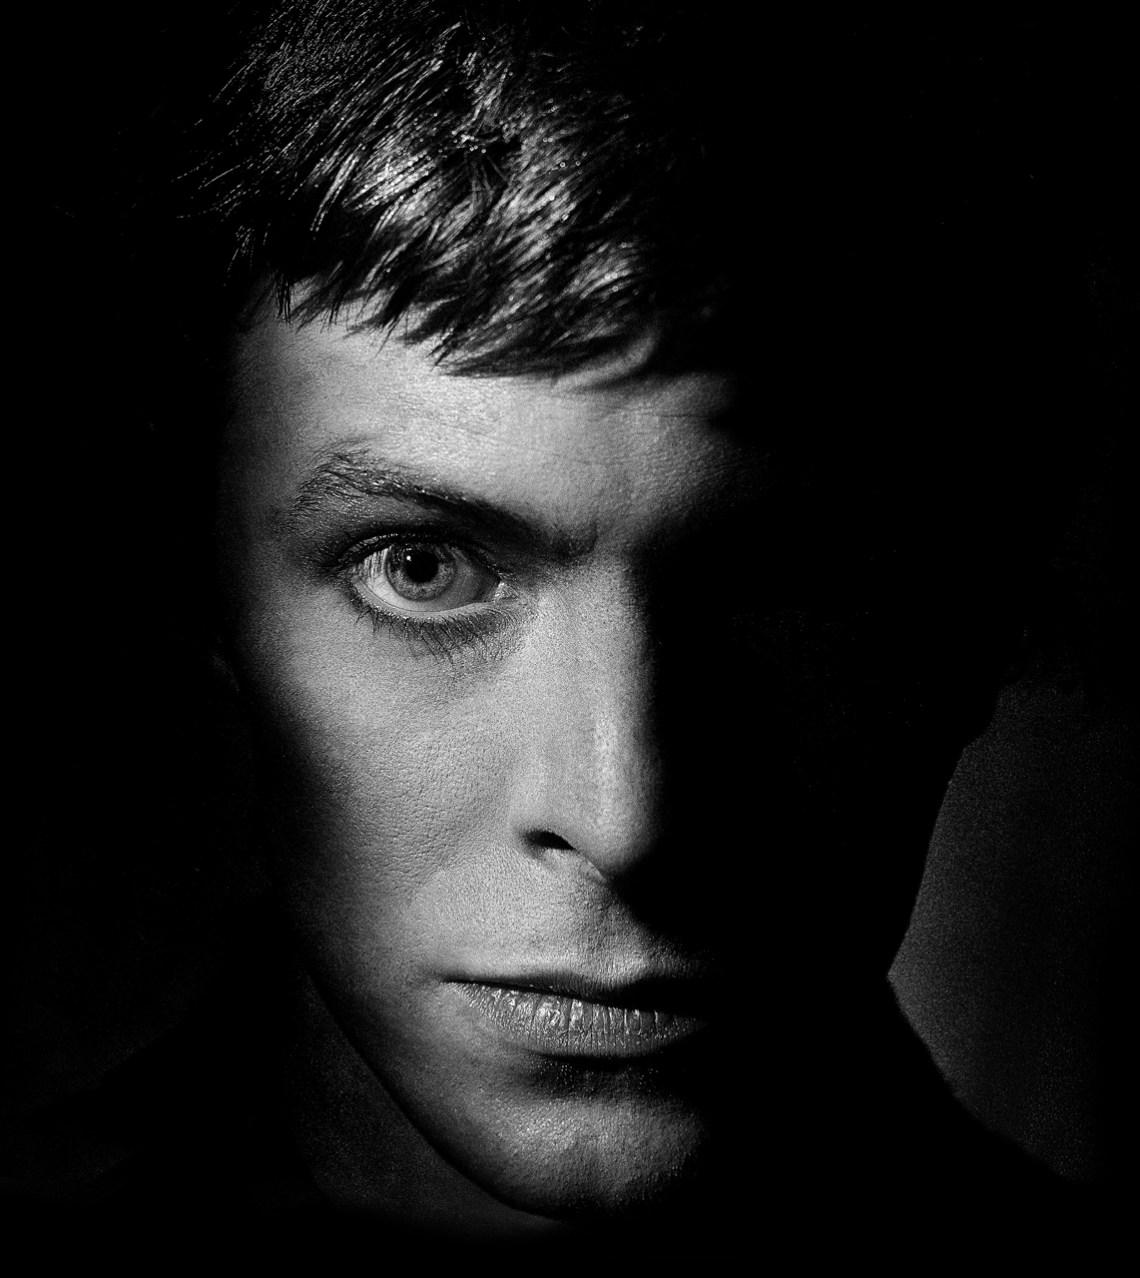 David-Bowie.-Dark.Arrowsmith.Dark.©